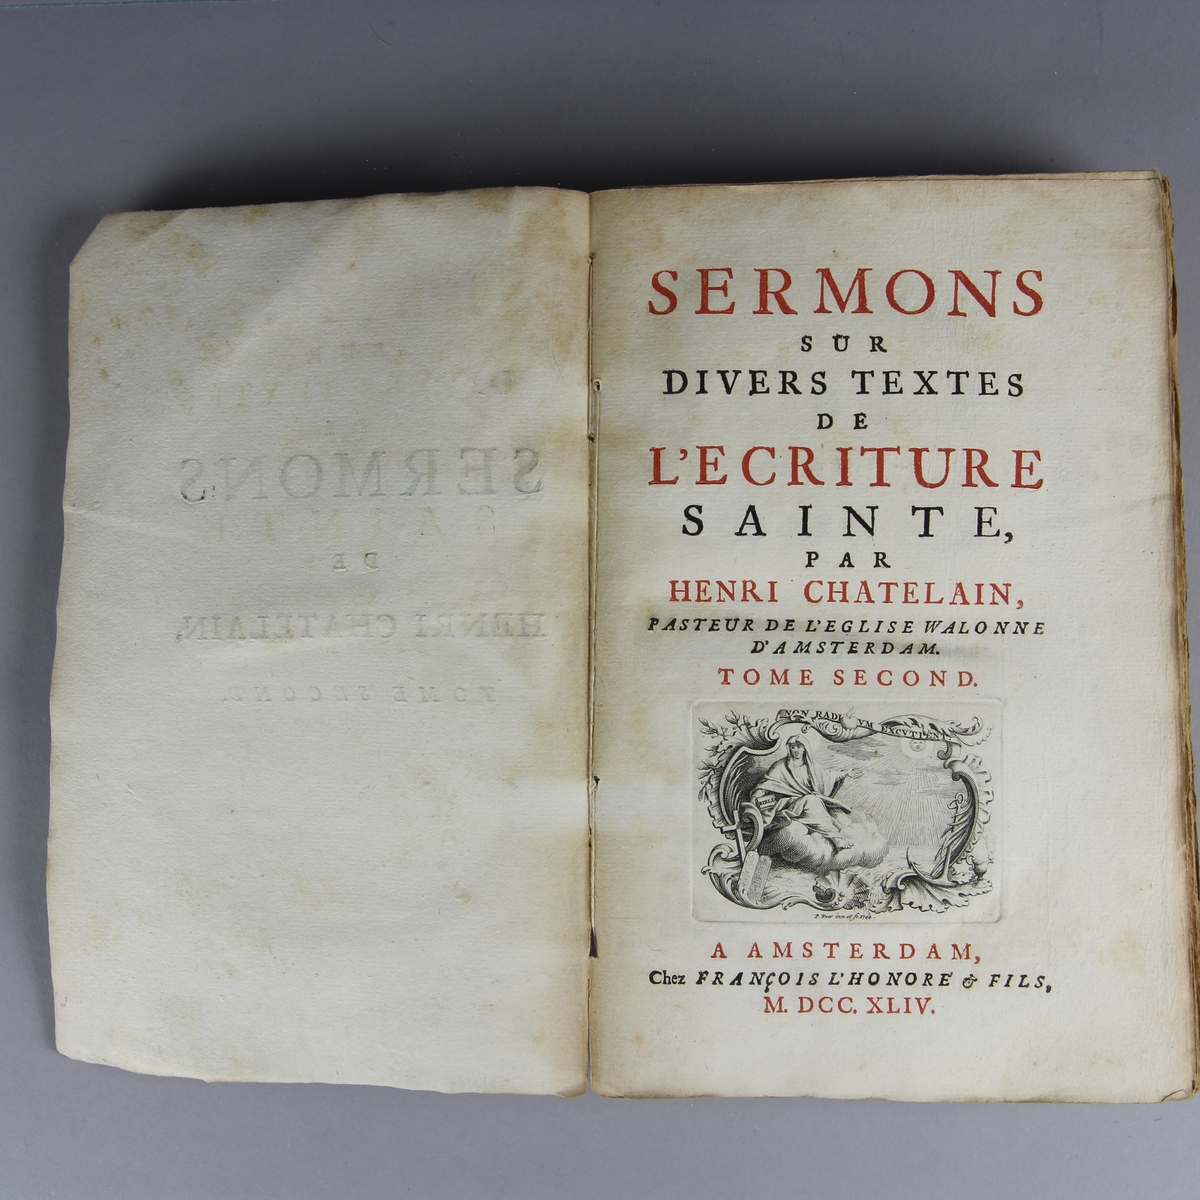 "Bok, häftad, ""Sermons sur divers textes de l´écriture sainte"". Pärmar av marmorerat papper, oskuret snitt."